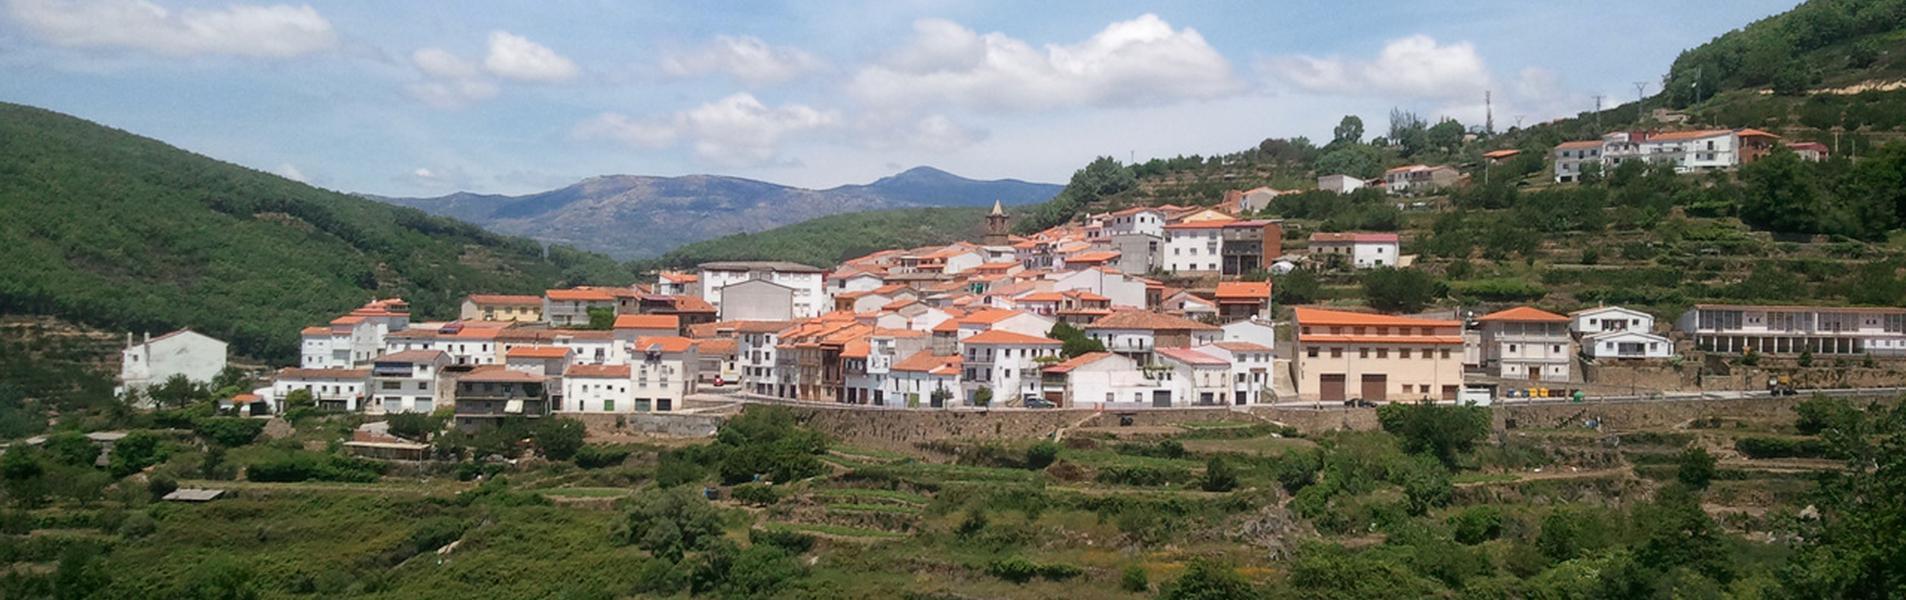 Barrado